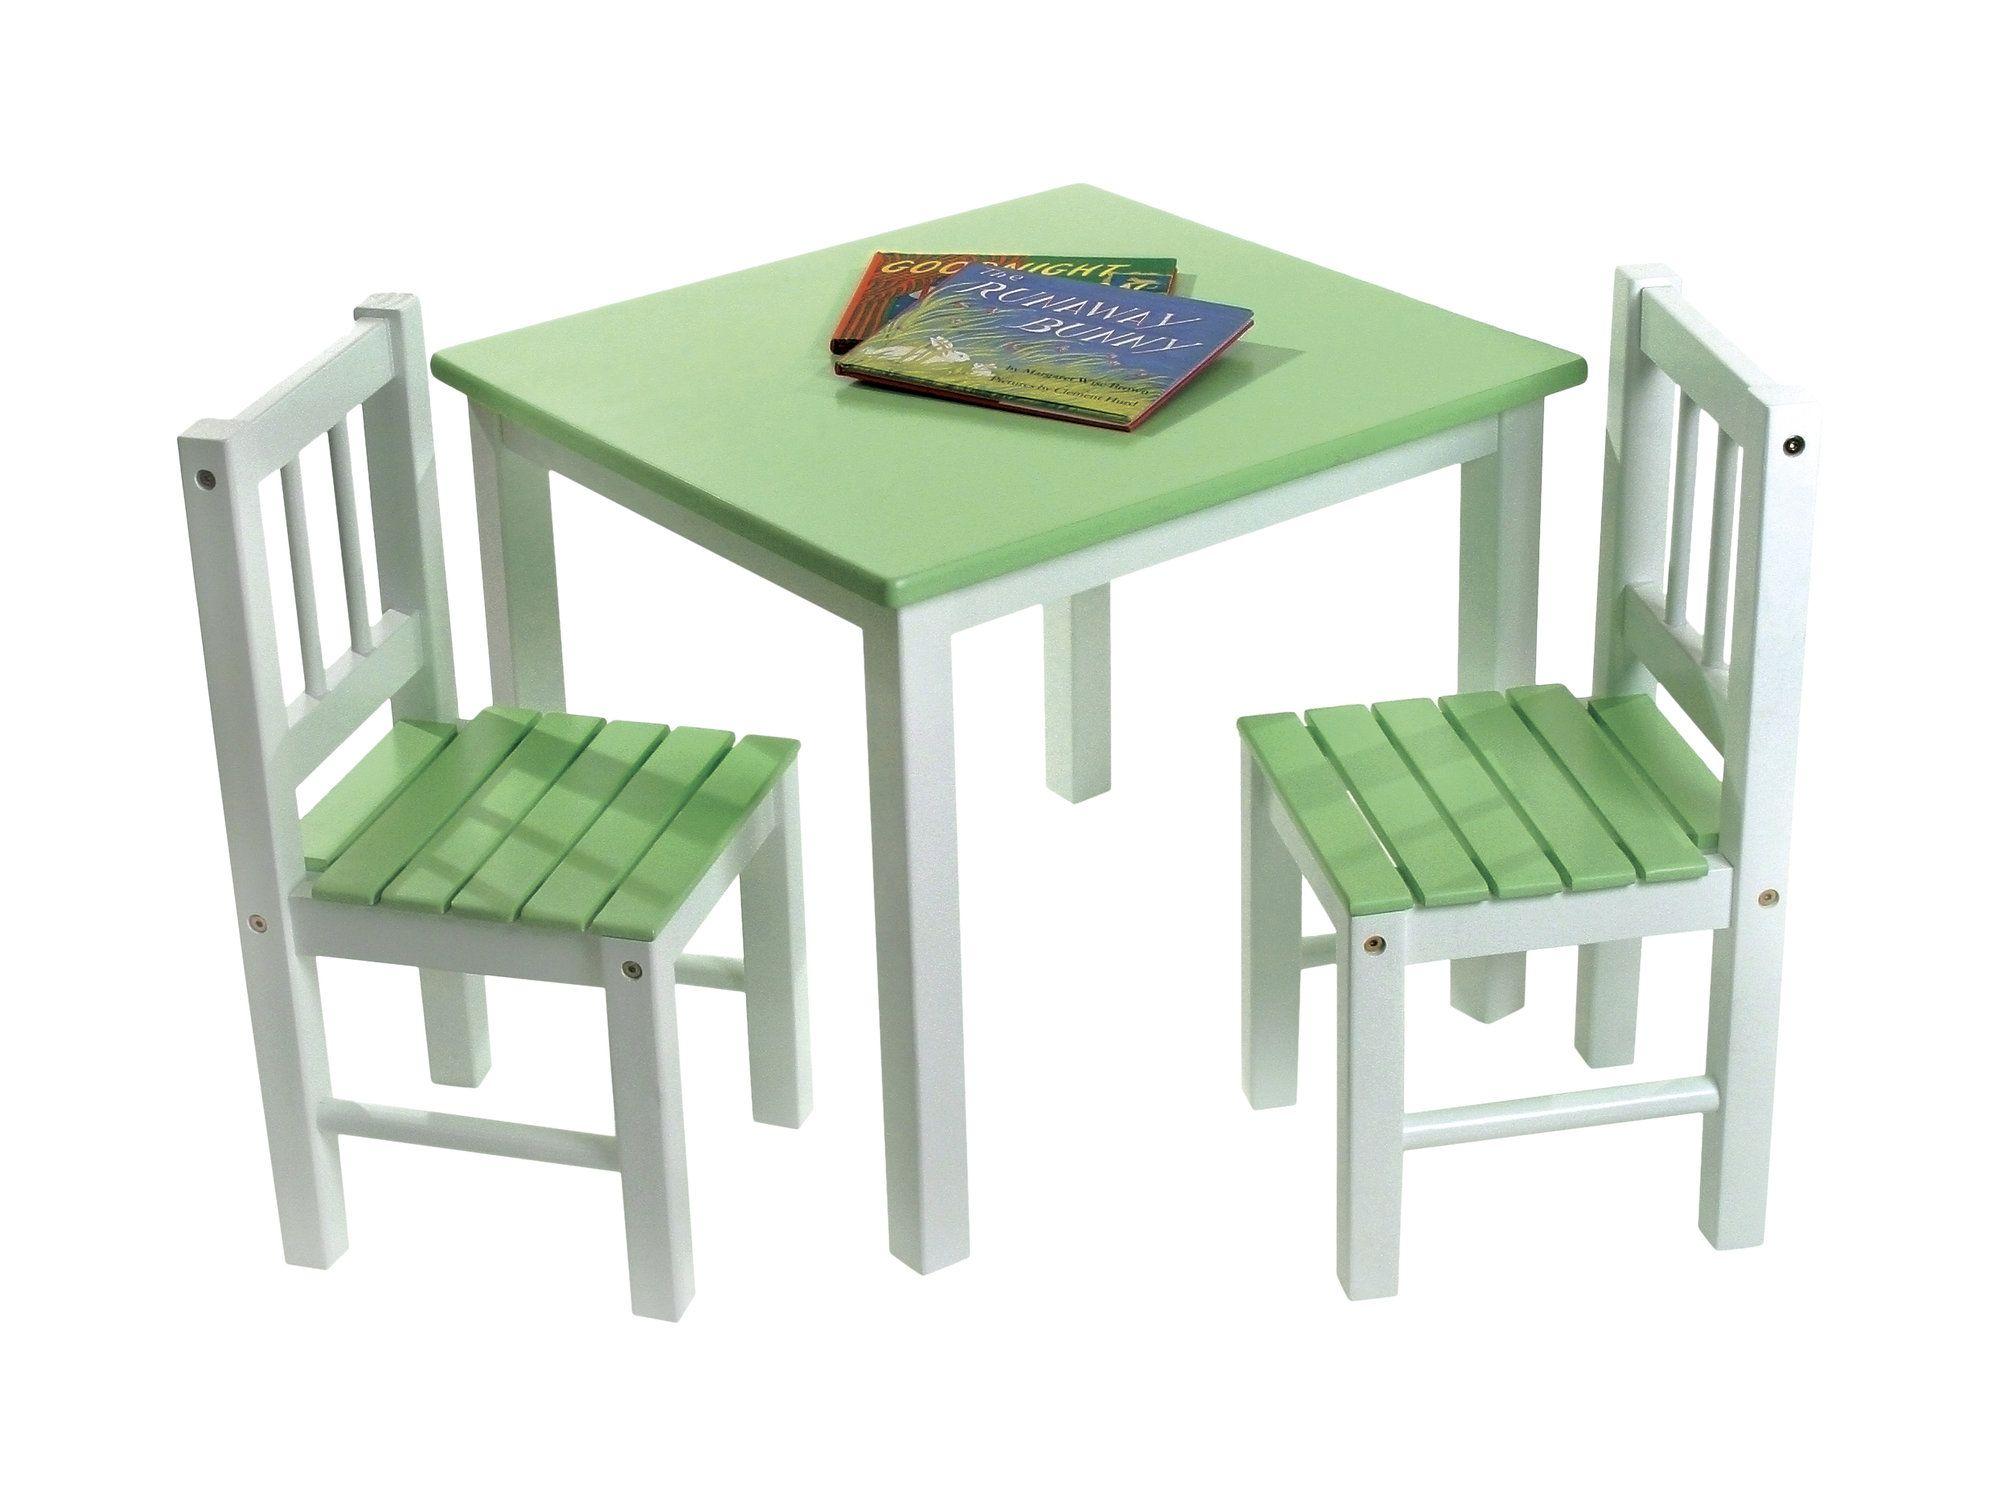 b27737fad7a Alexa Kids  3 Piece Table and Chair Set